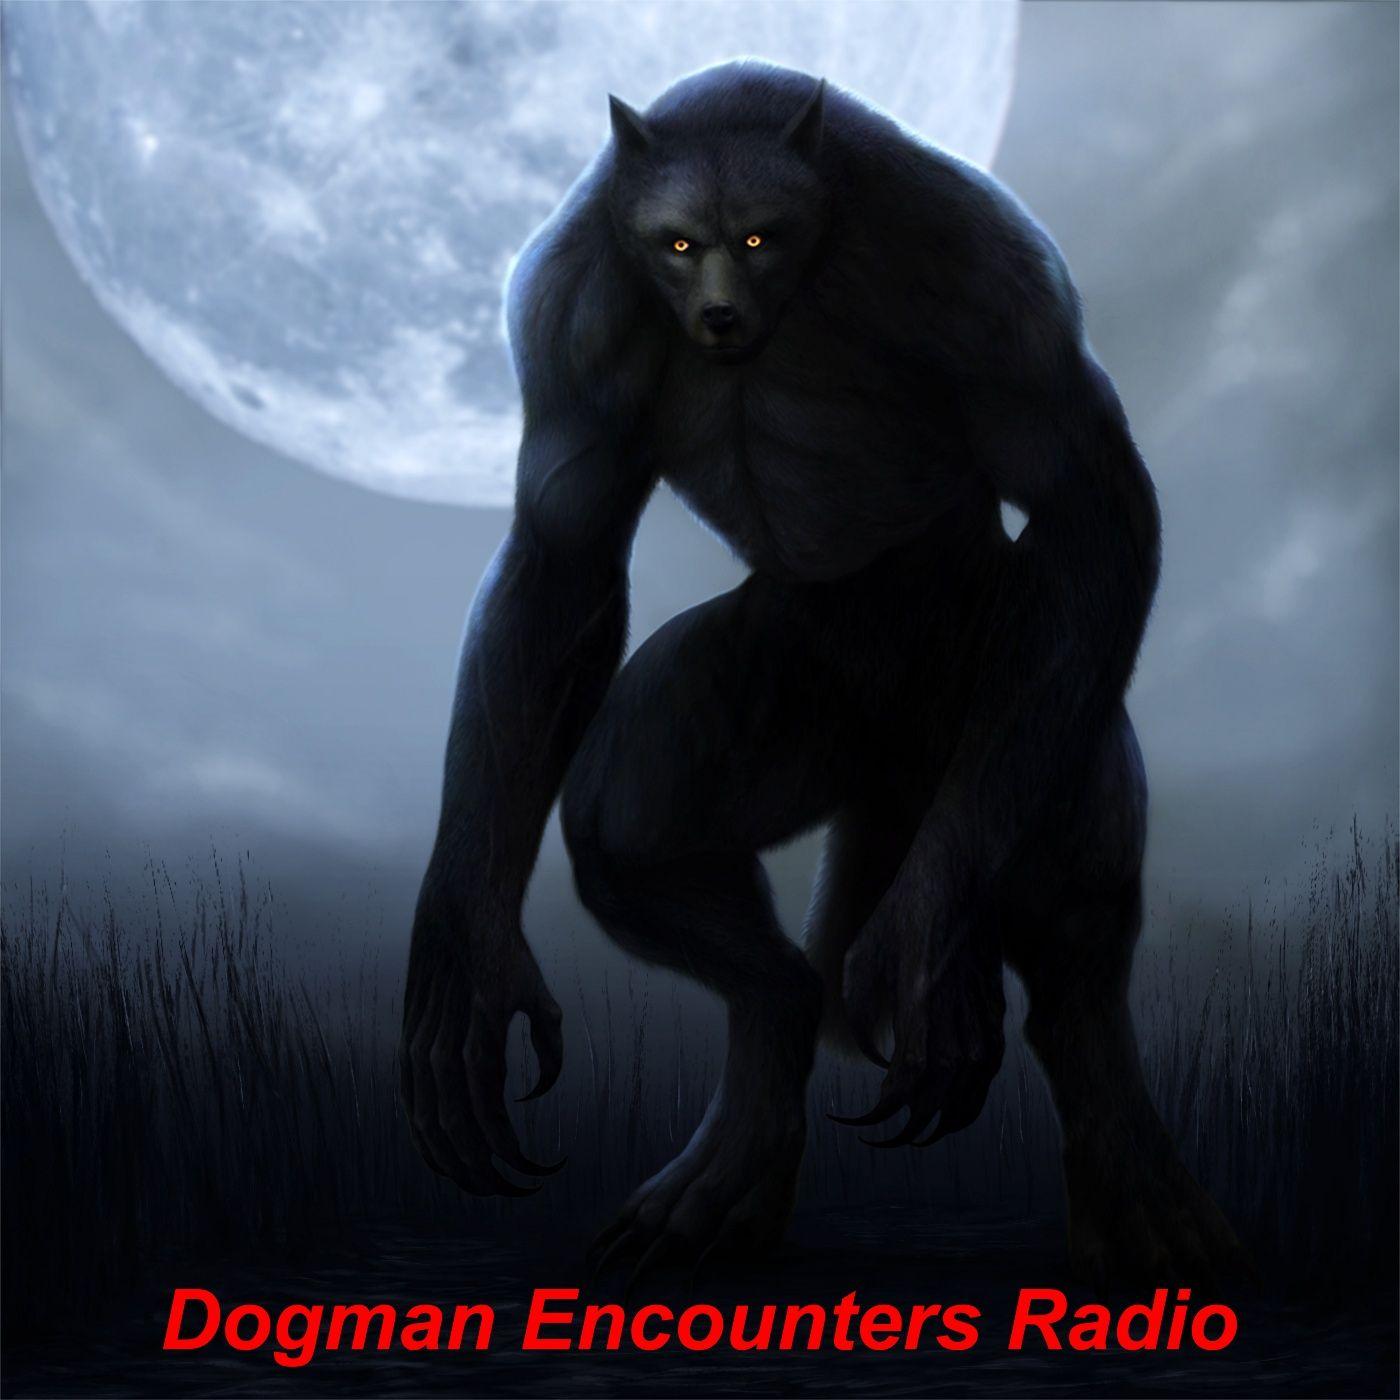 Dogman Encounters Episode 376 (The Dogman Grabbed him in His Sleeping Bag!)